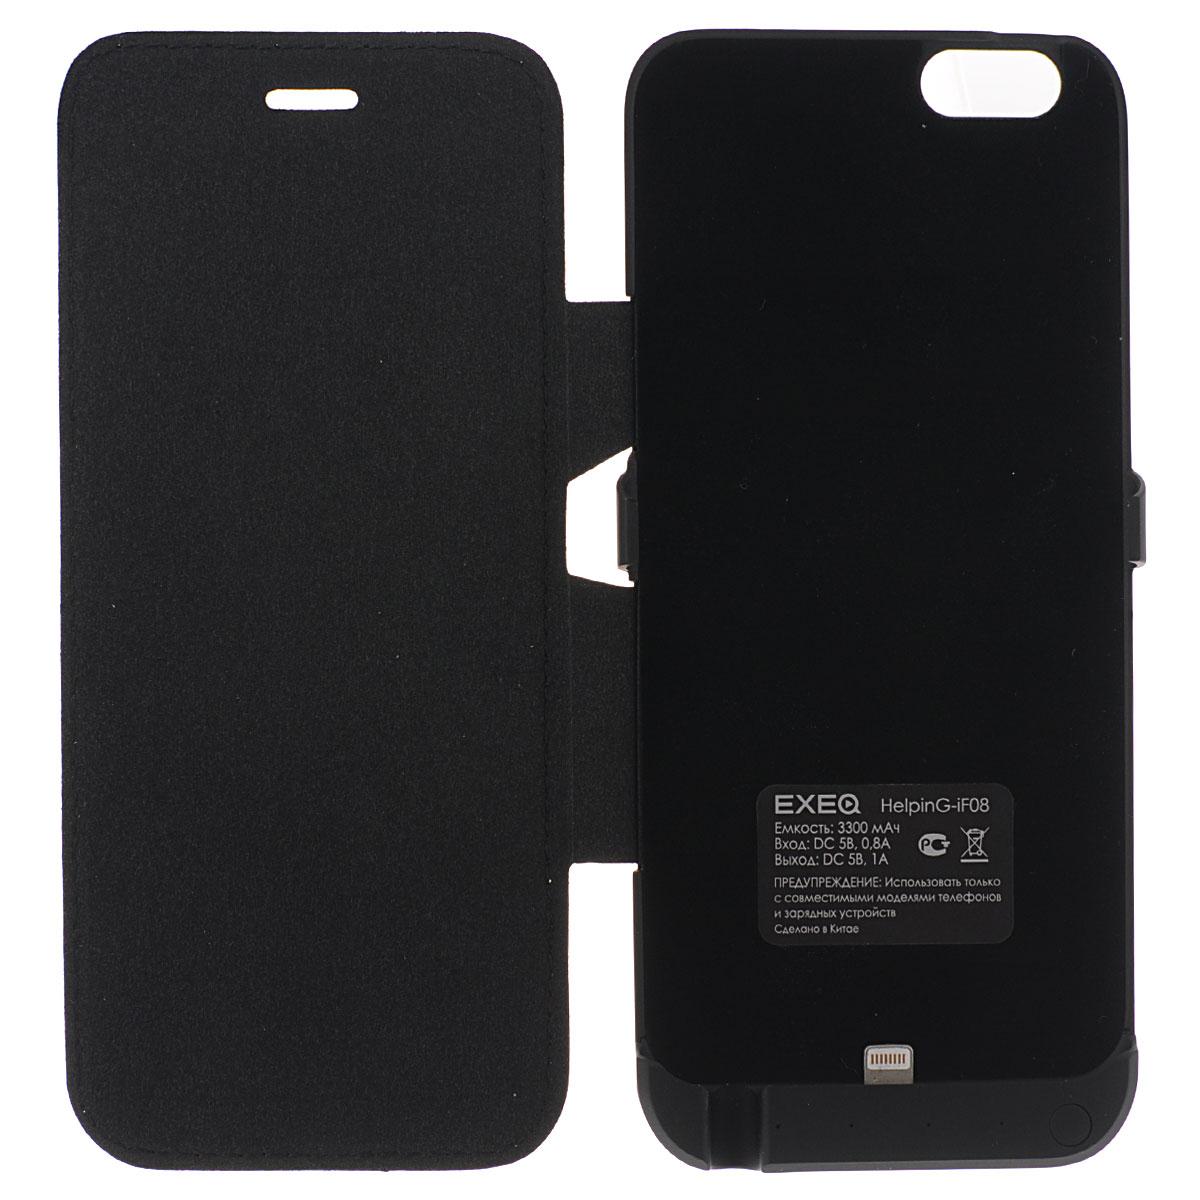 EXEQ HelpinG-iF08 чехол-аккумулятор для iPhone 6, Black (3300 мАч, флип-кейс)